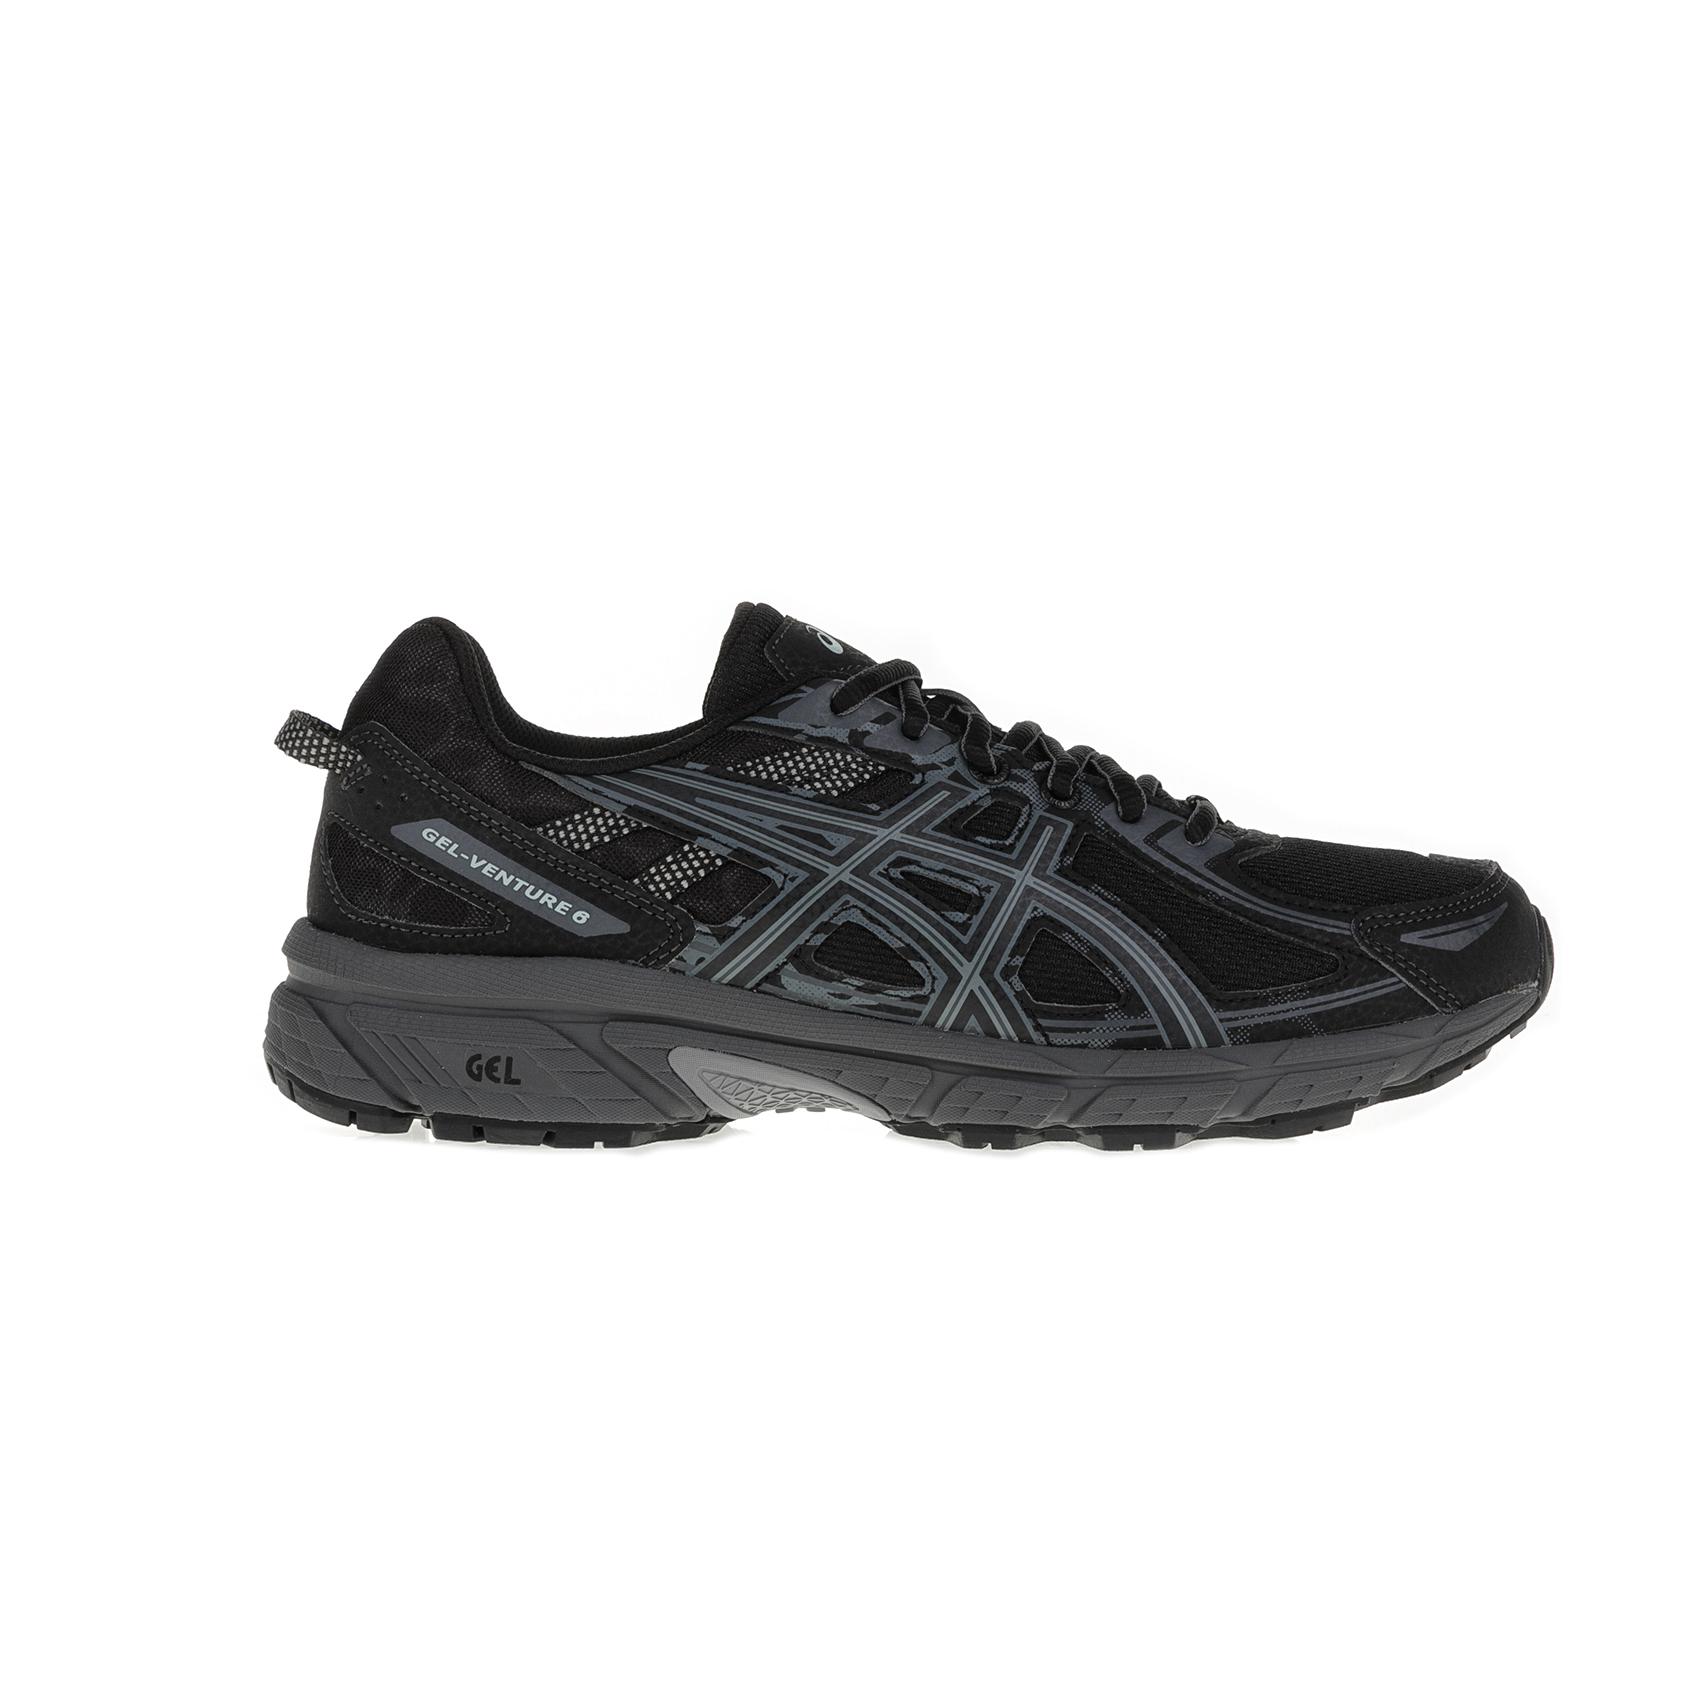 ASICS - Ανδρικά αθλητικά παπούτσια ASICS GEL-VENTURE 6 GS μαύρα ανδρικά παπούτσια αθλητικά running